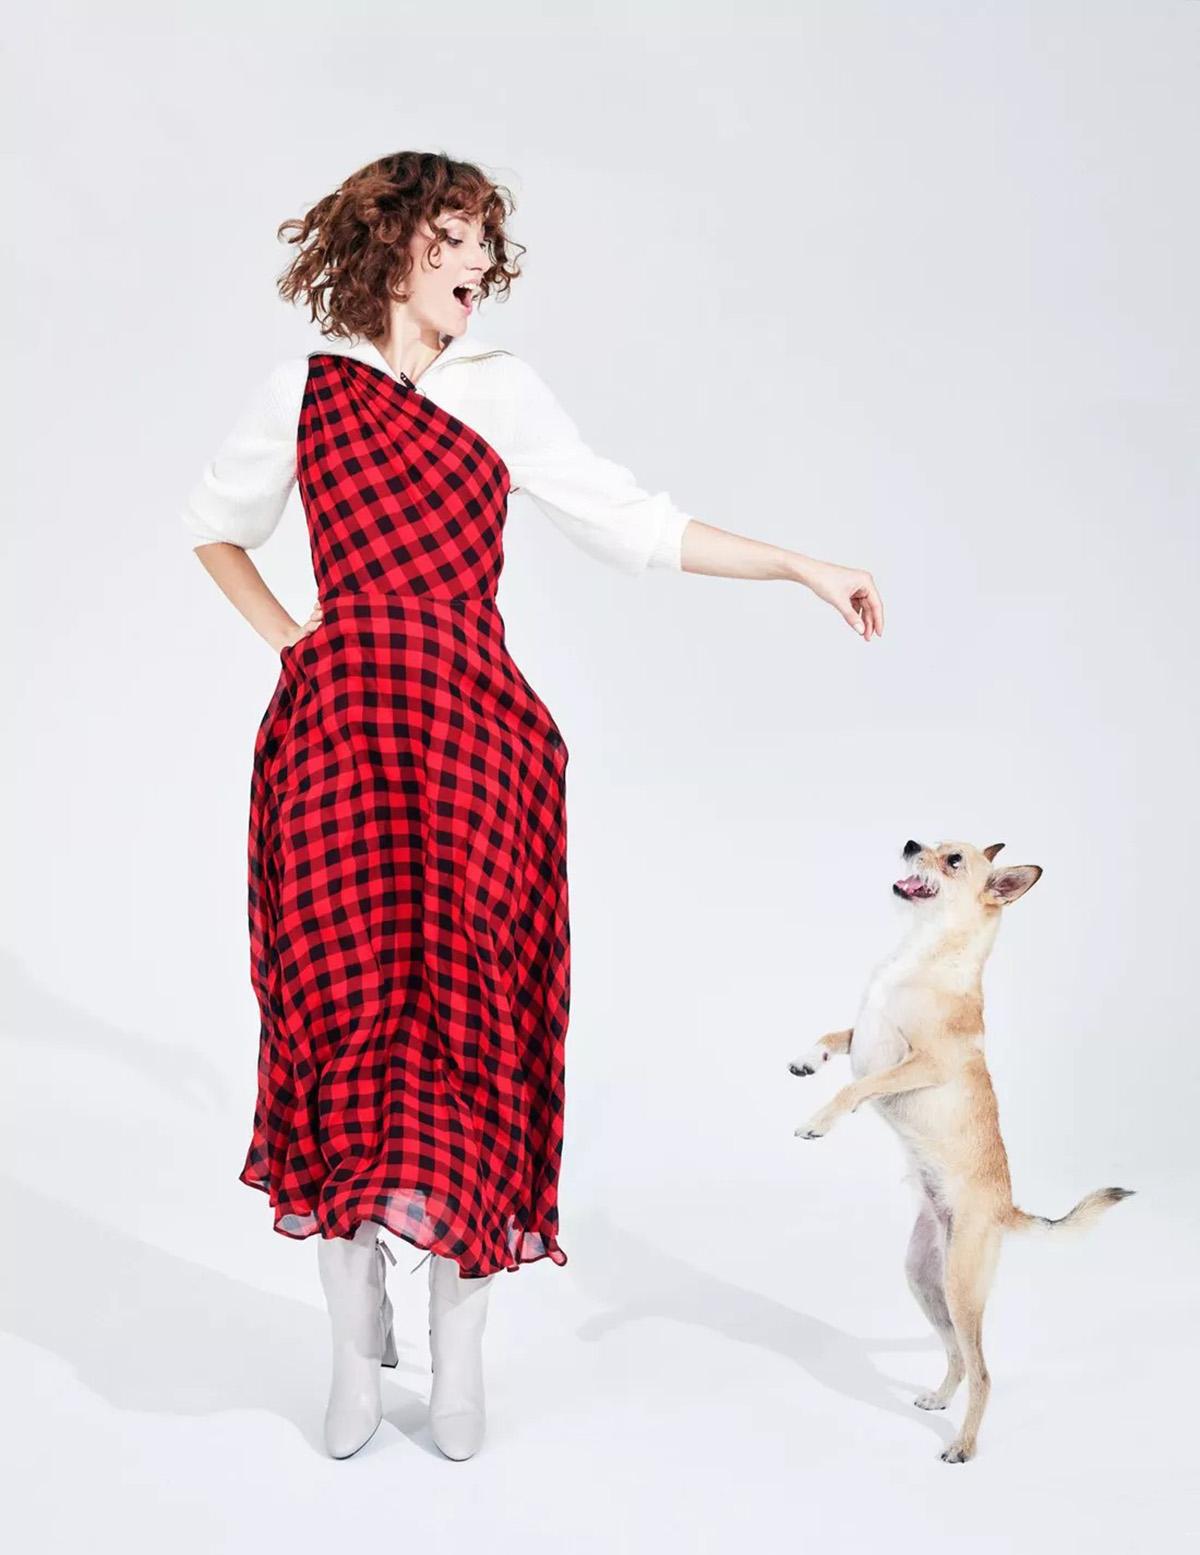 Laura Gavrilenko by Marc Philbert for Madame Figaro October 1st, 2021